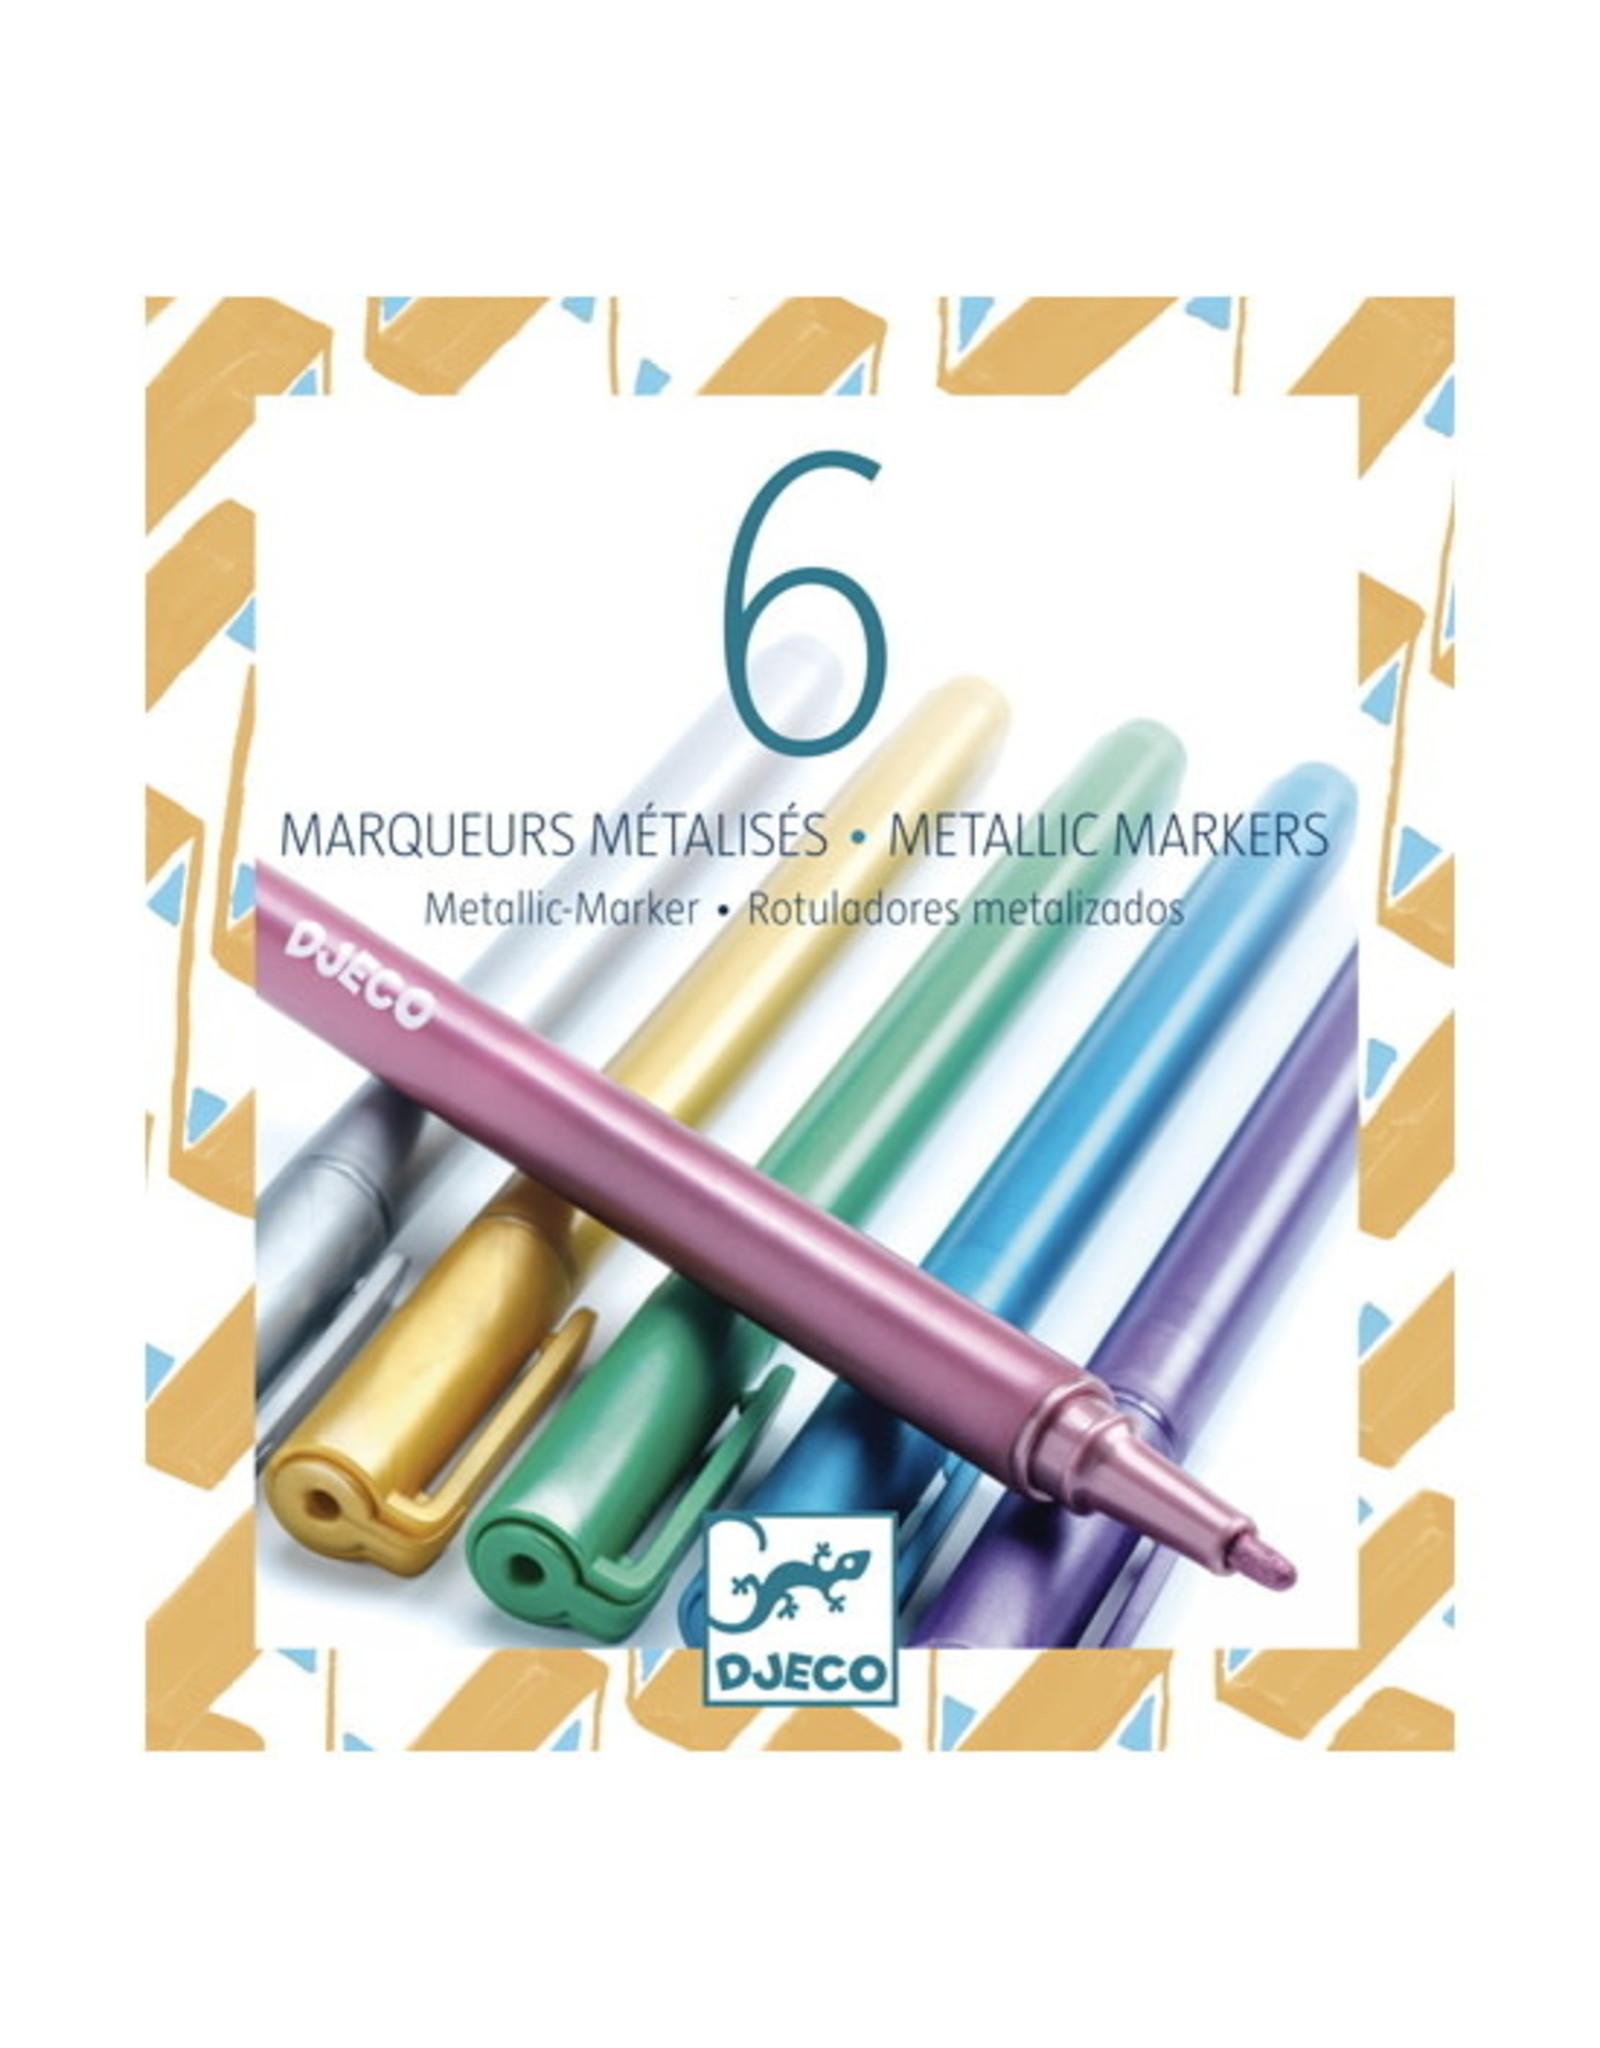 Djeco 6 Metallic Markers